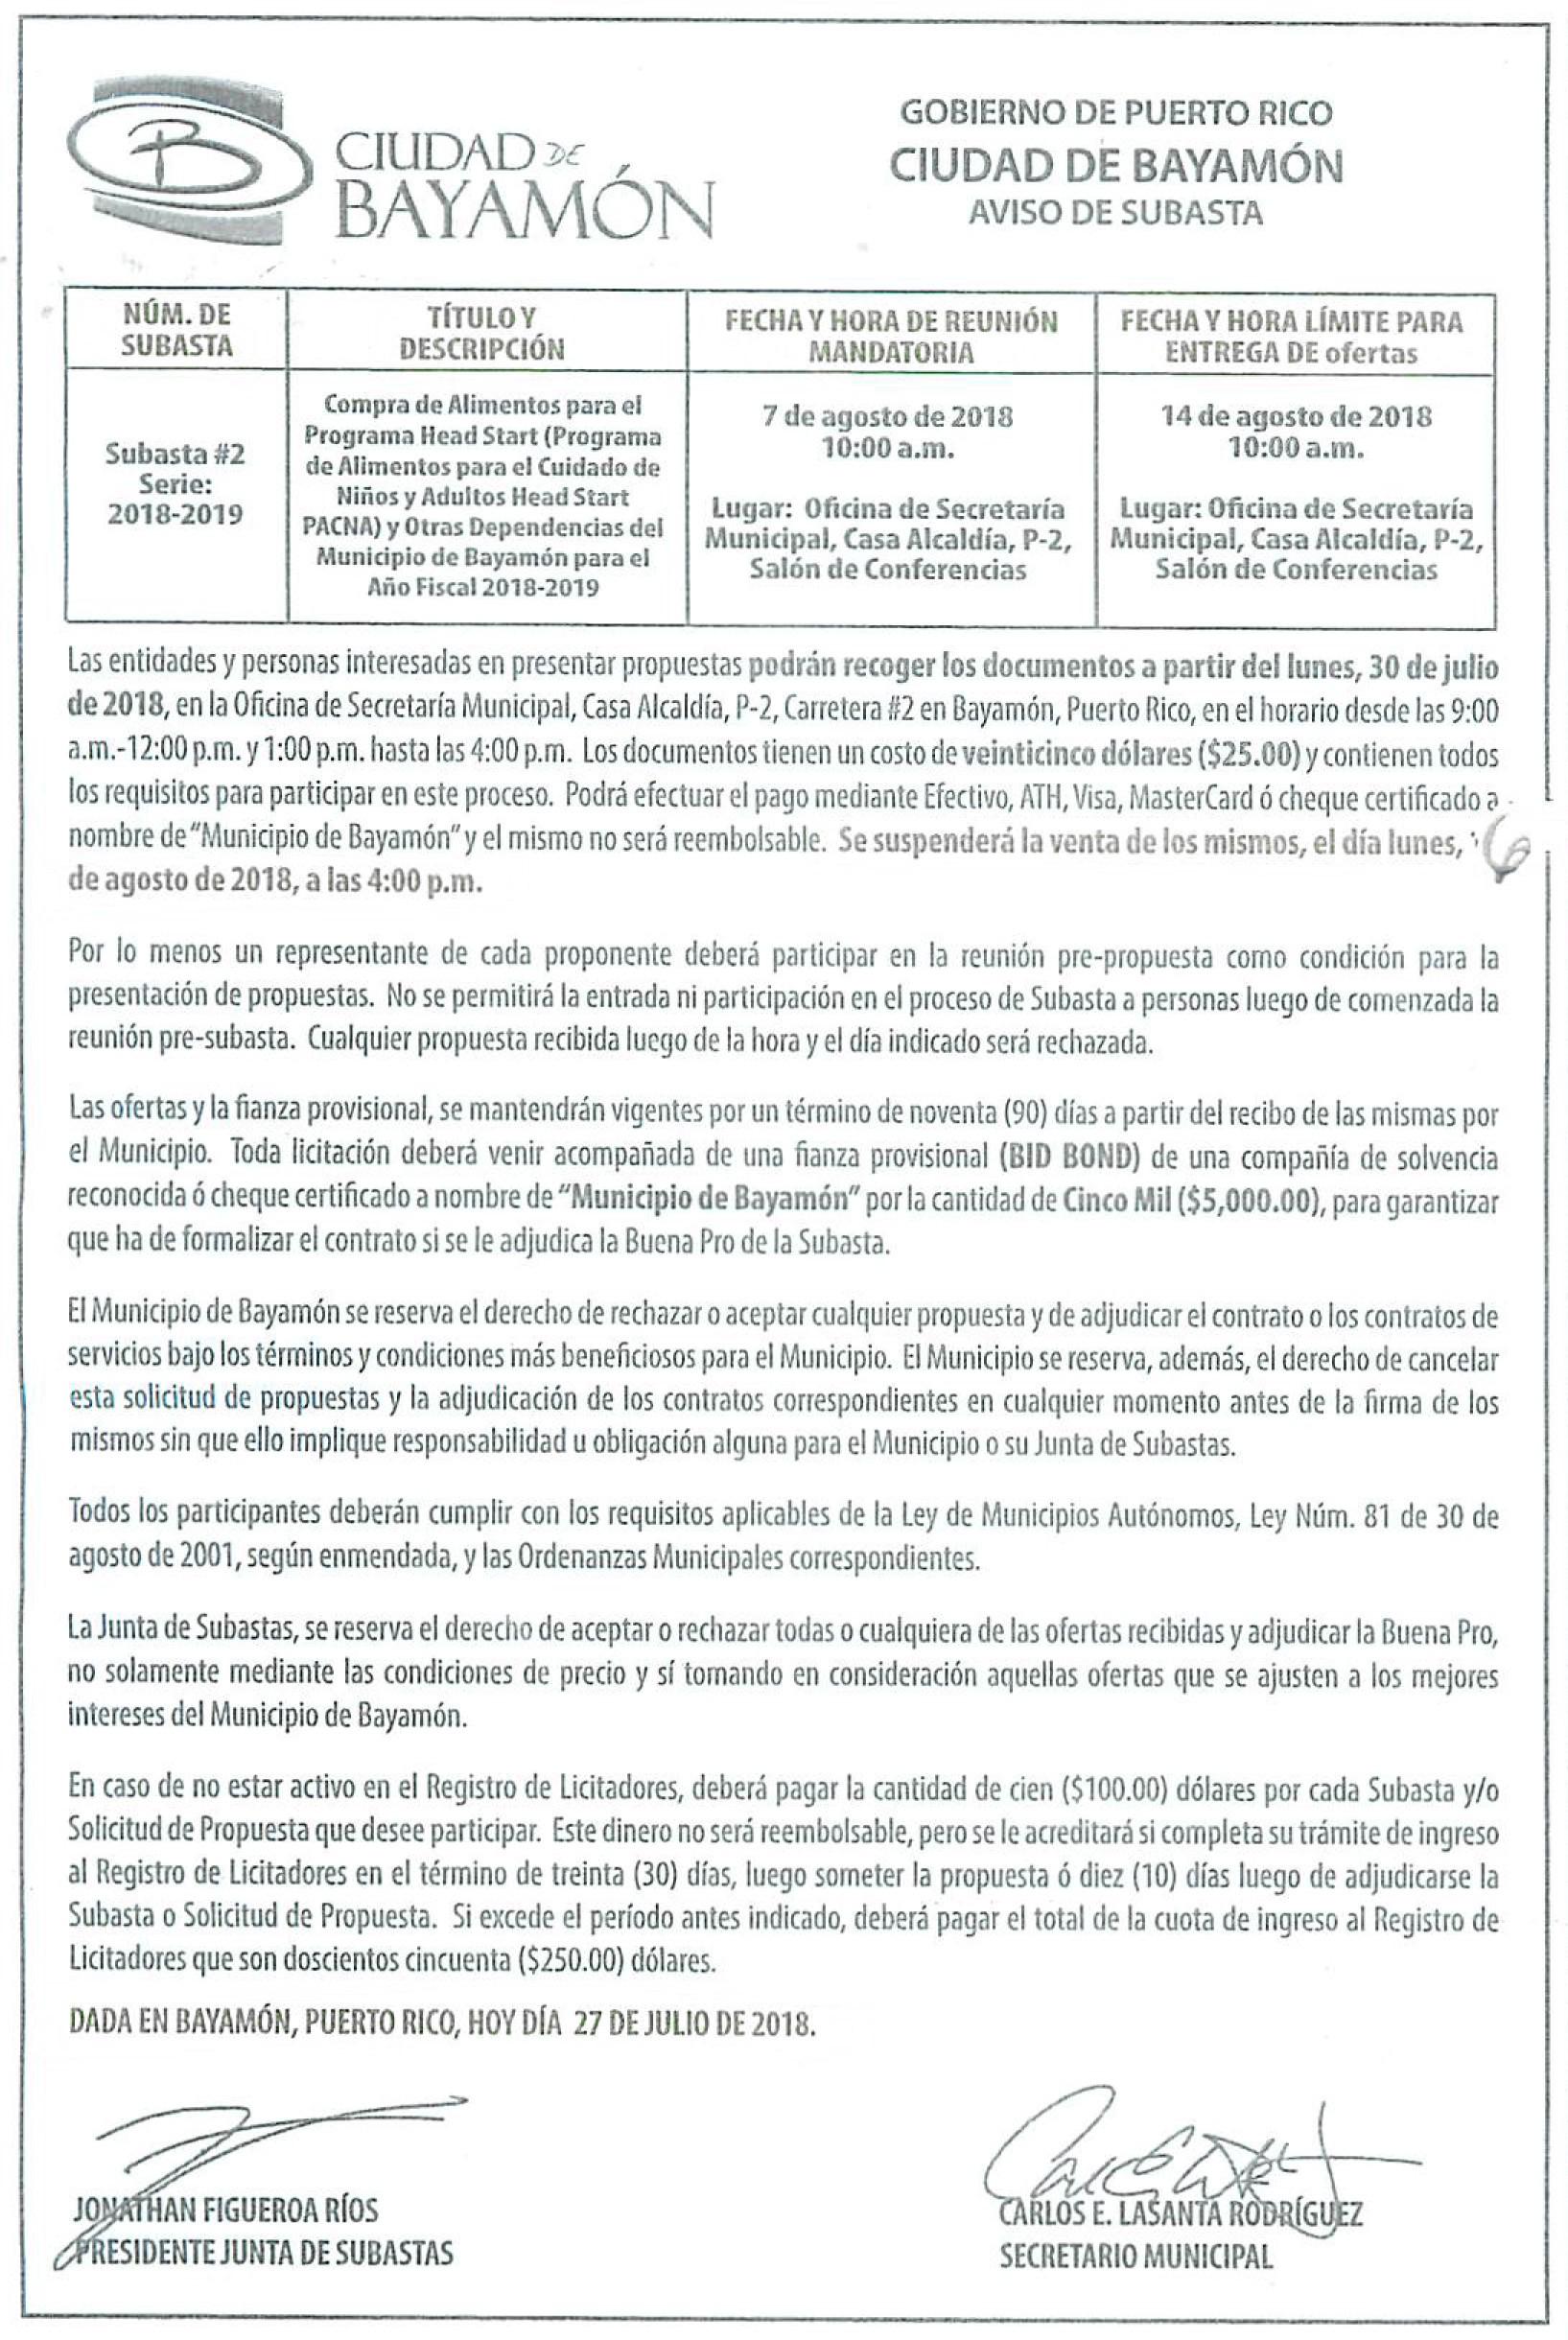 Calendario Abril 2019 Para Imprimir Pdf Recientes Avisos Pºblicos Ciudad De Bayam³n Of Calendario Abril 2019 Para Imprimir Pdf Más Actual 2020 2021 Calendar Printable Template